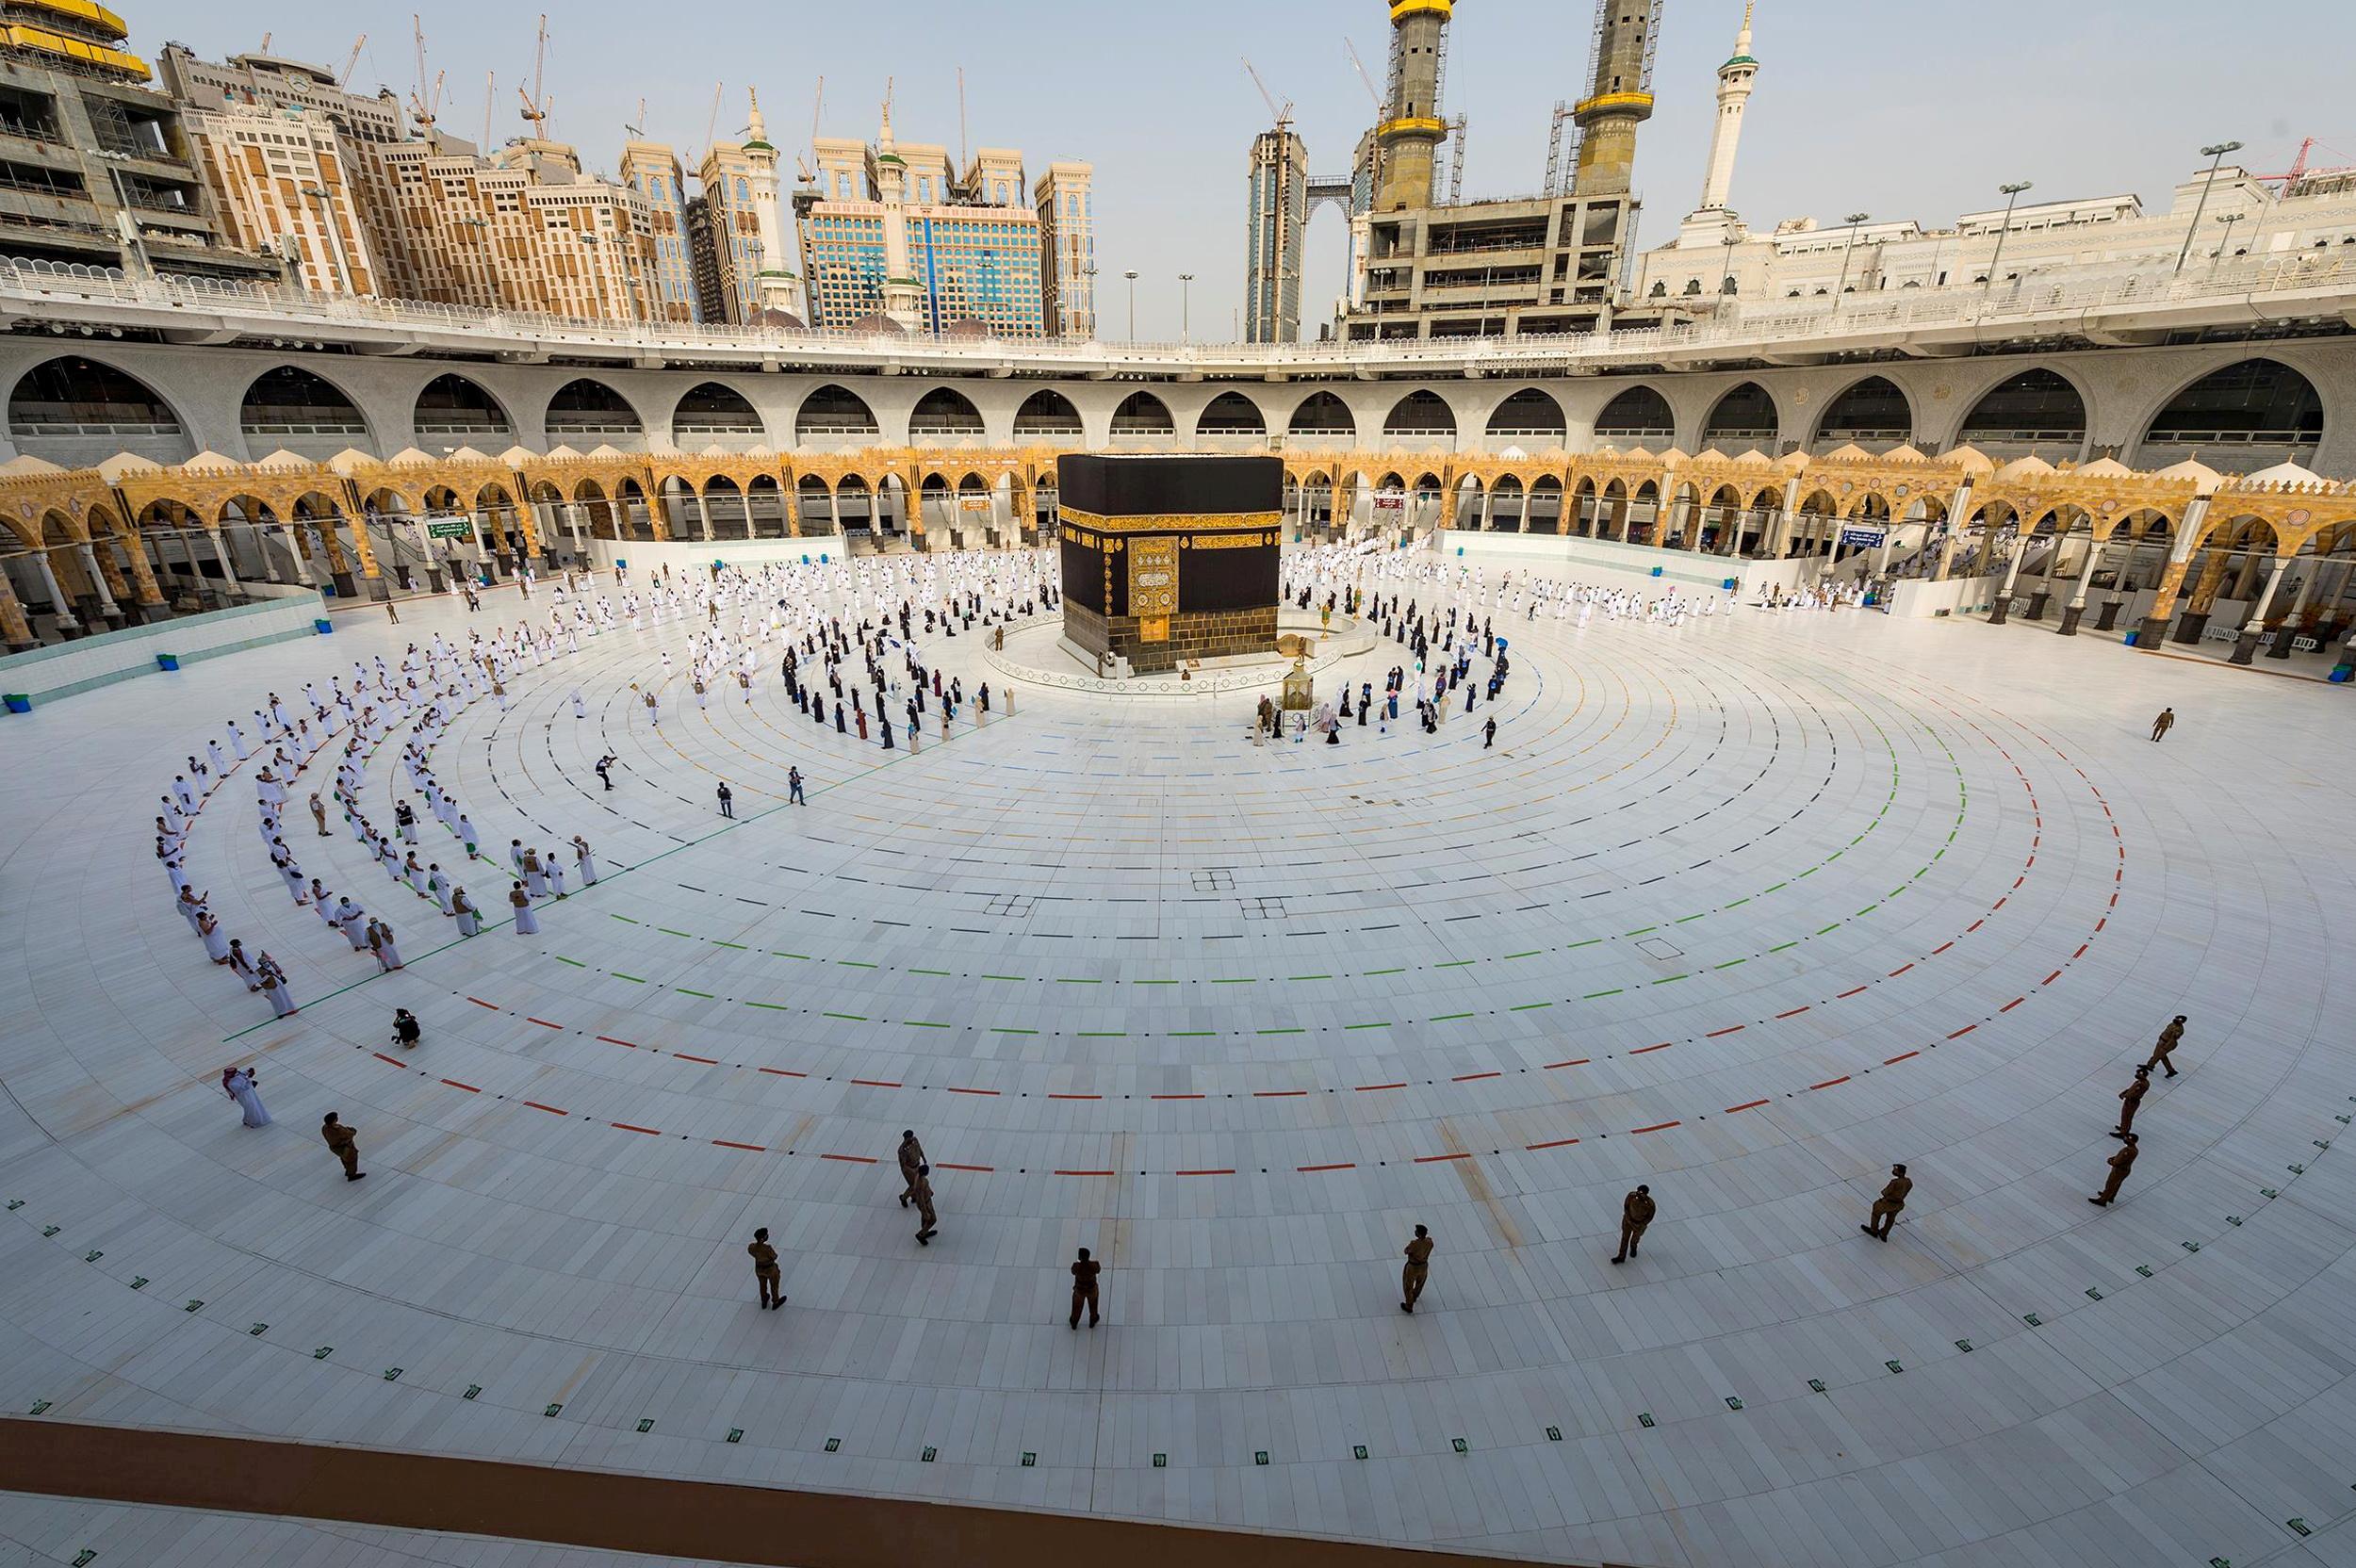 General view of Kaaba as Muslim pilgrims wearing face masks and keeping social distance pray facing Kaaba during the annual Haj pilgrimage amid the coronavirus disease (COVID-19) pandemic, in the holy city of Mecca, Saudi Arabia July 31, 2020. Saudi Press Agency/Handout via REUTERS